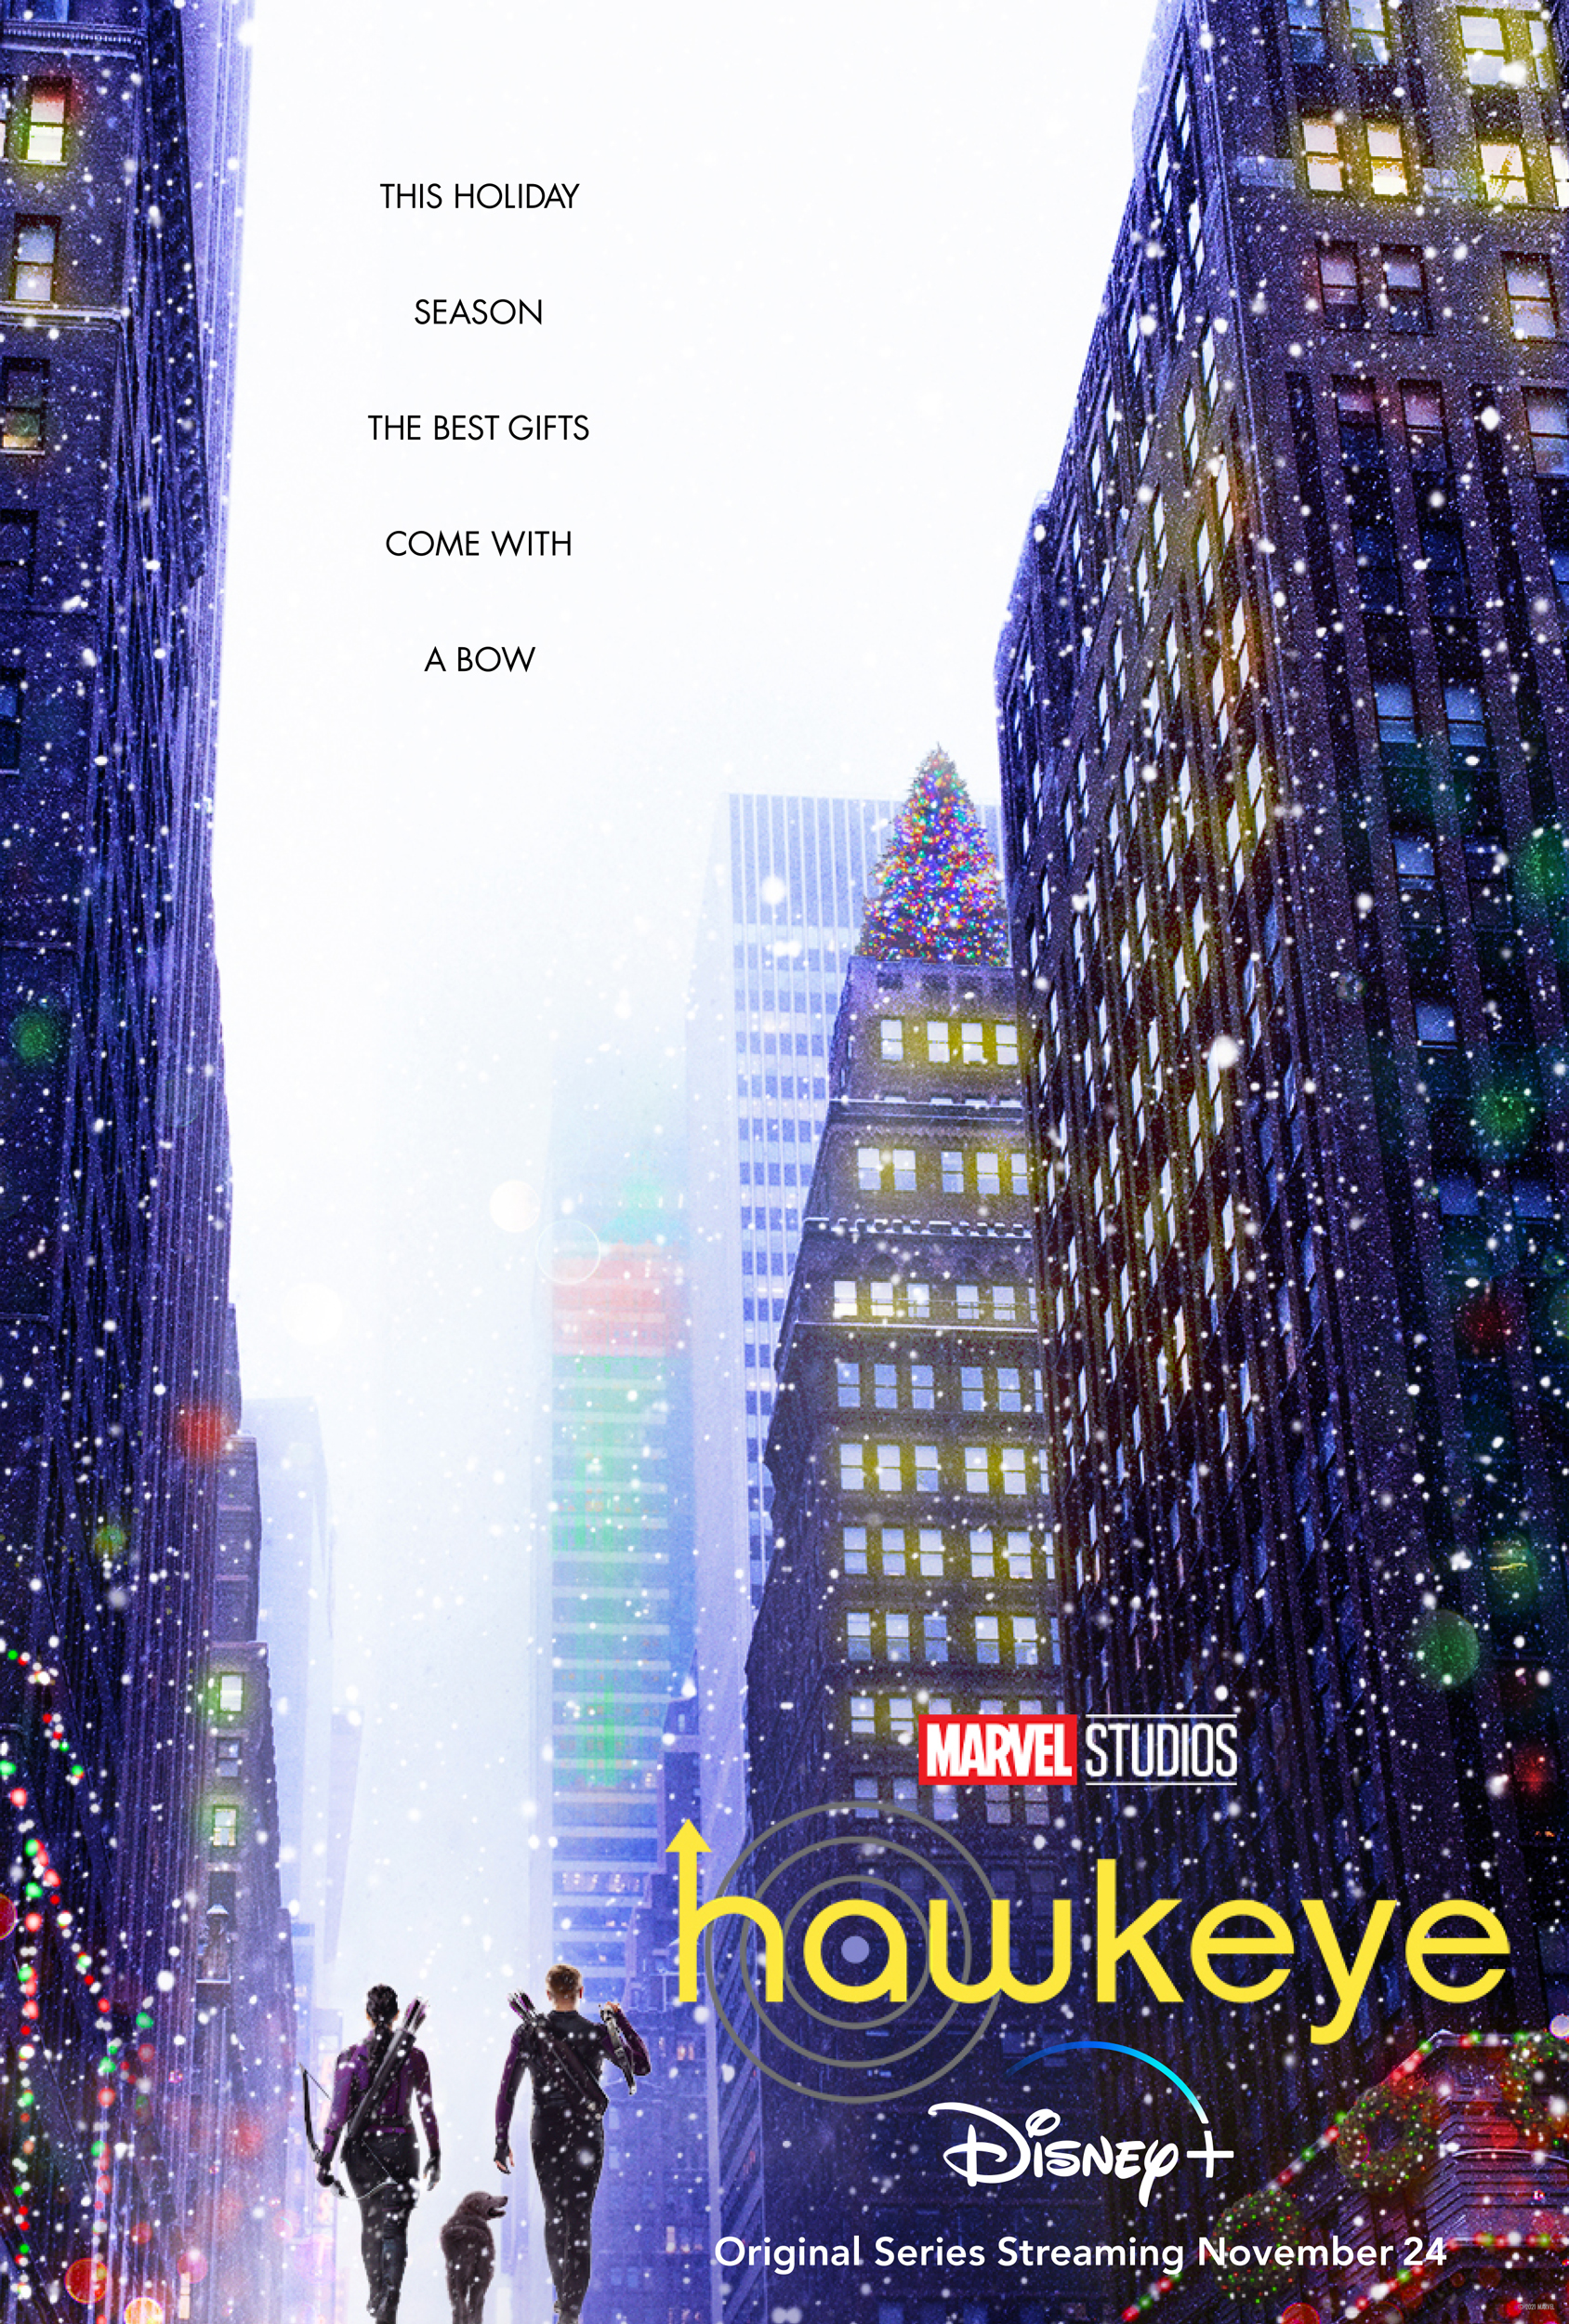 Marvel Studios' Hawkeye